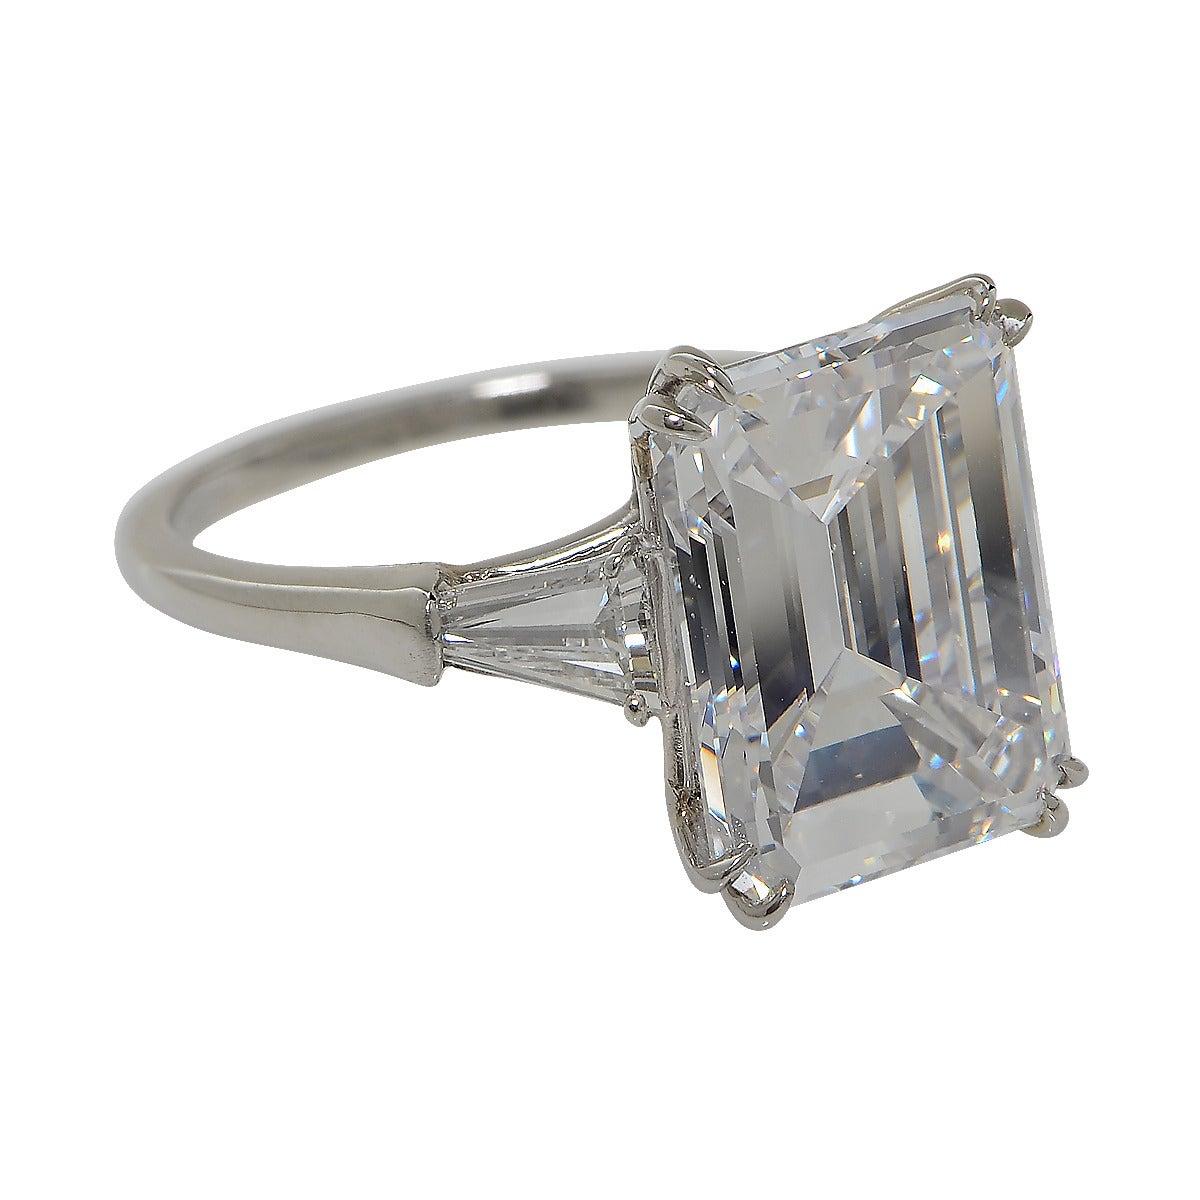 Harry Winston 6 77 Carat Emerald Cut Diamond Platinum Ring at 1stdibs